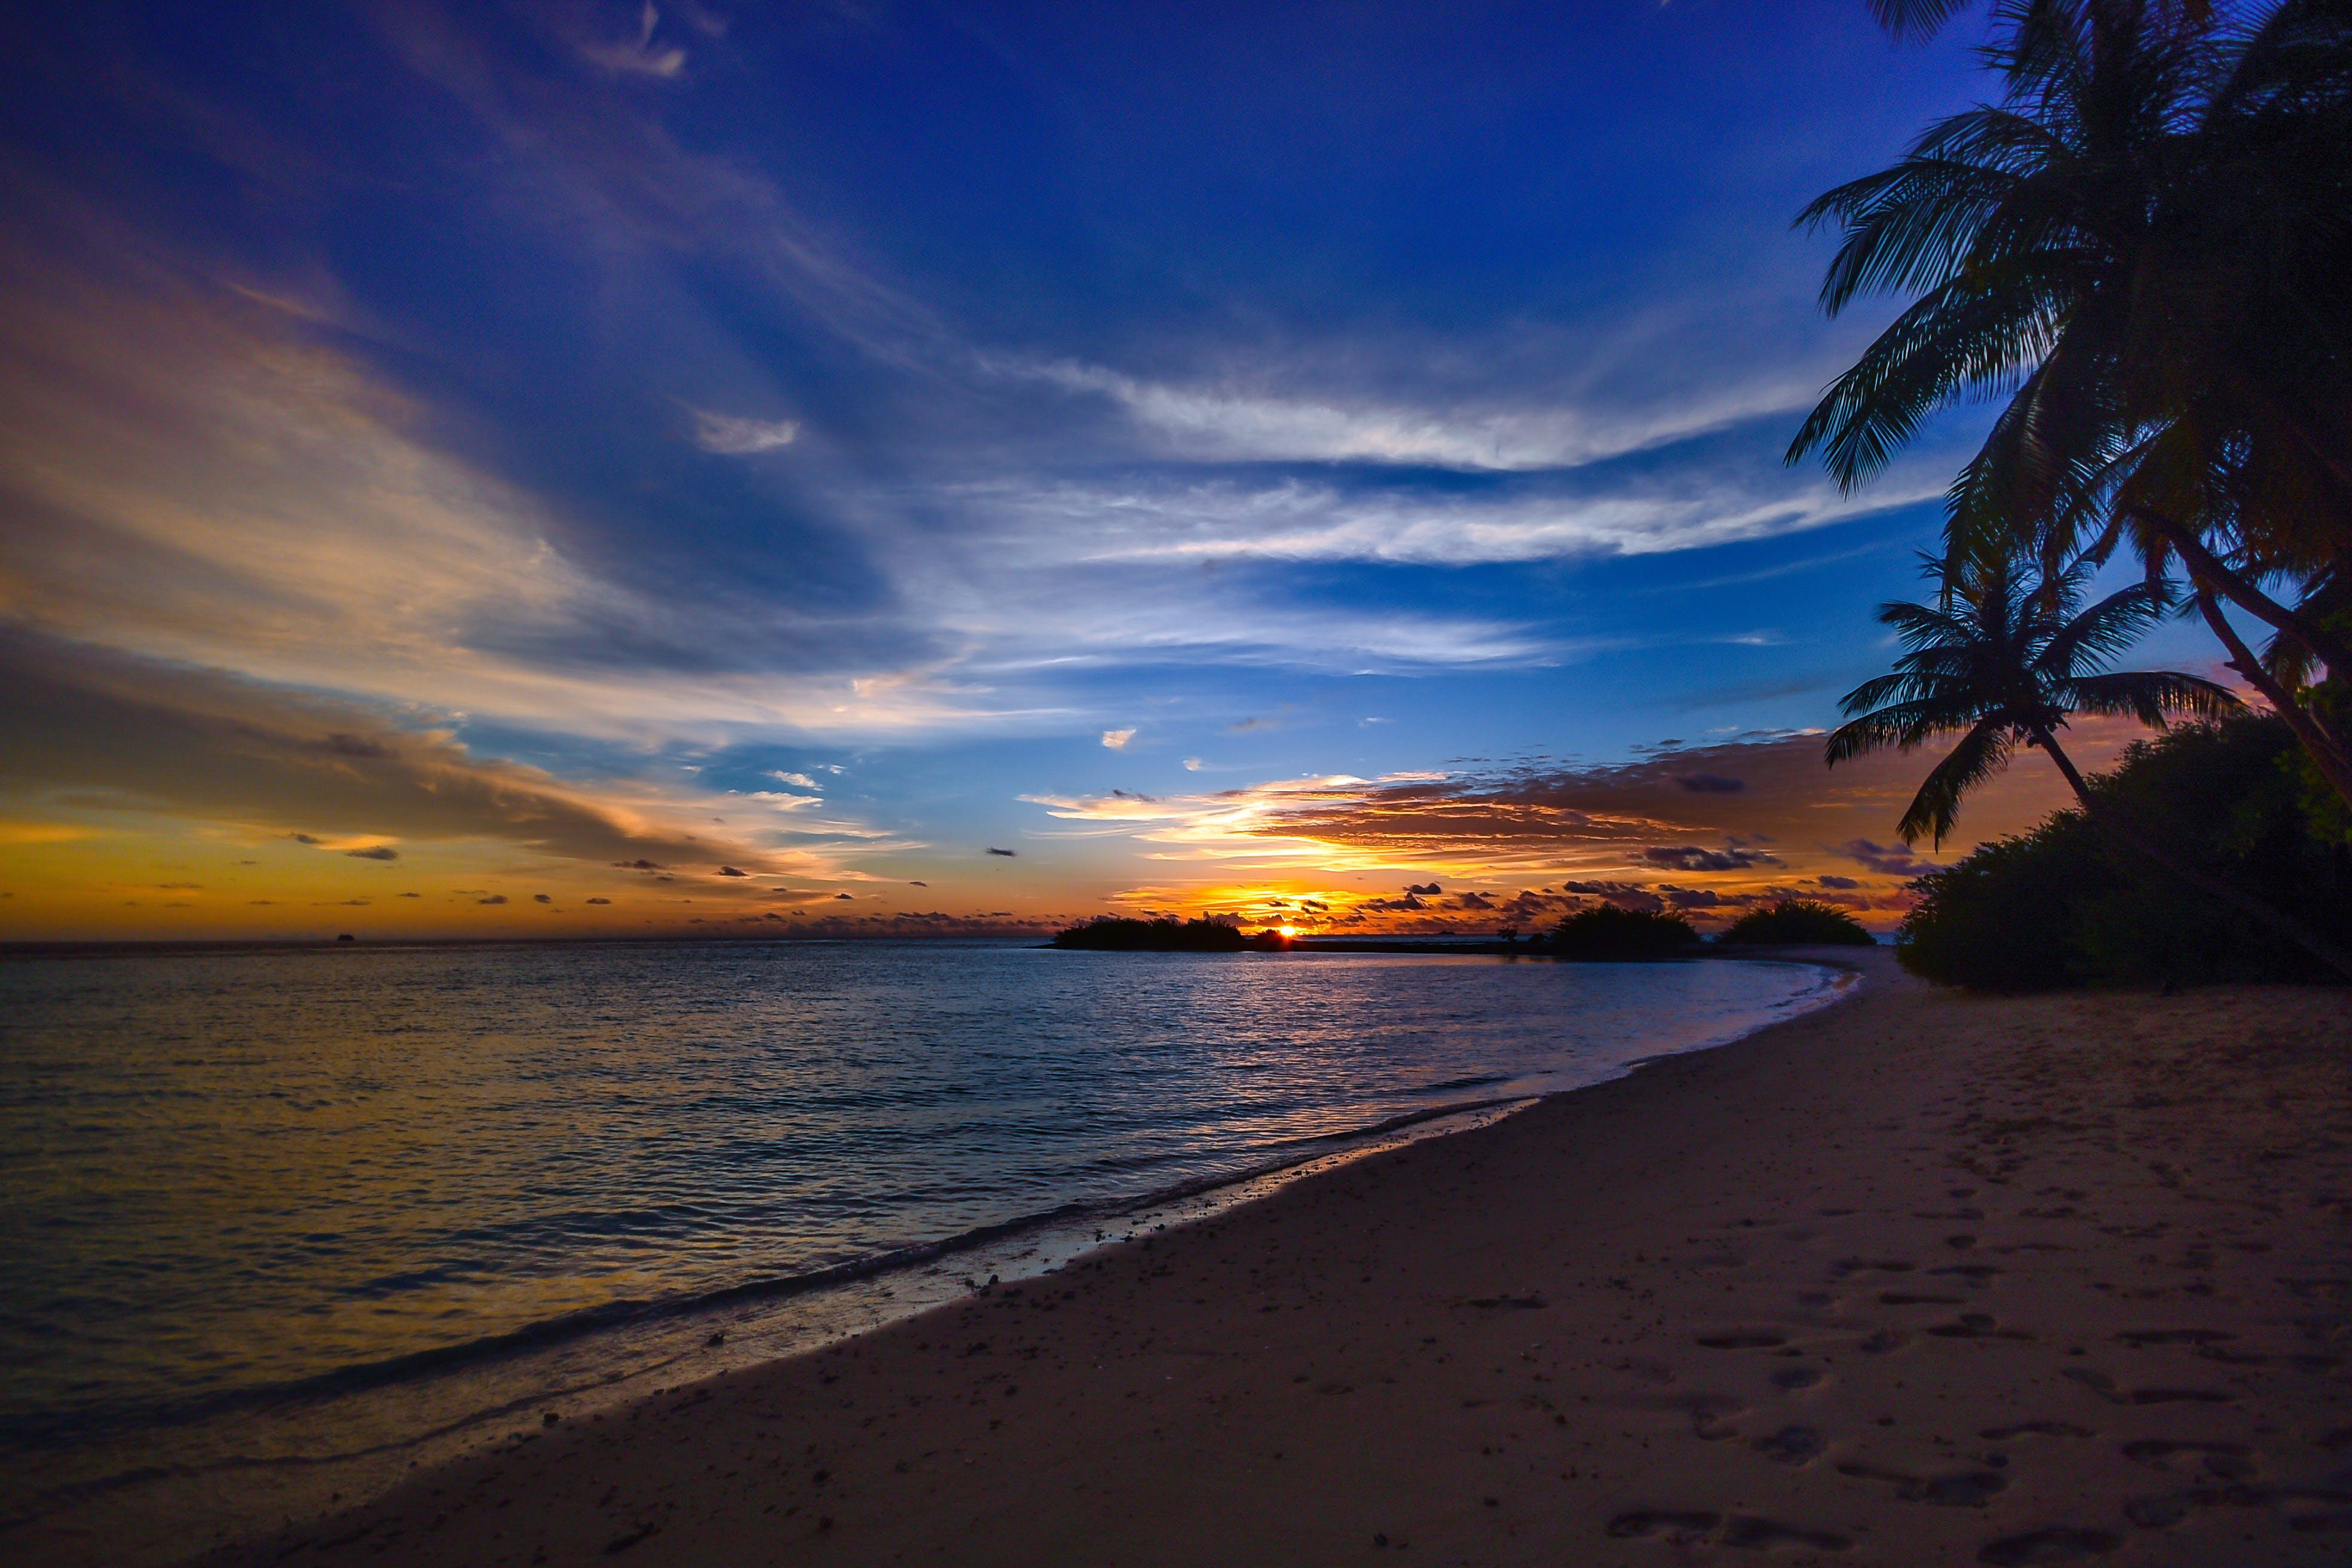 Silhouette of Seashore